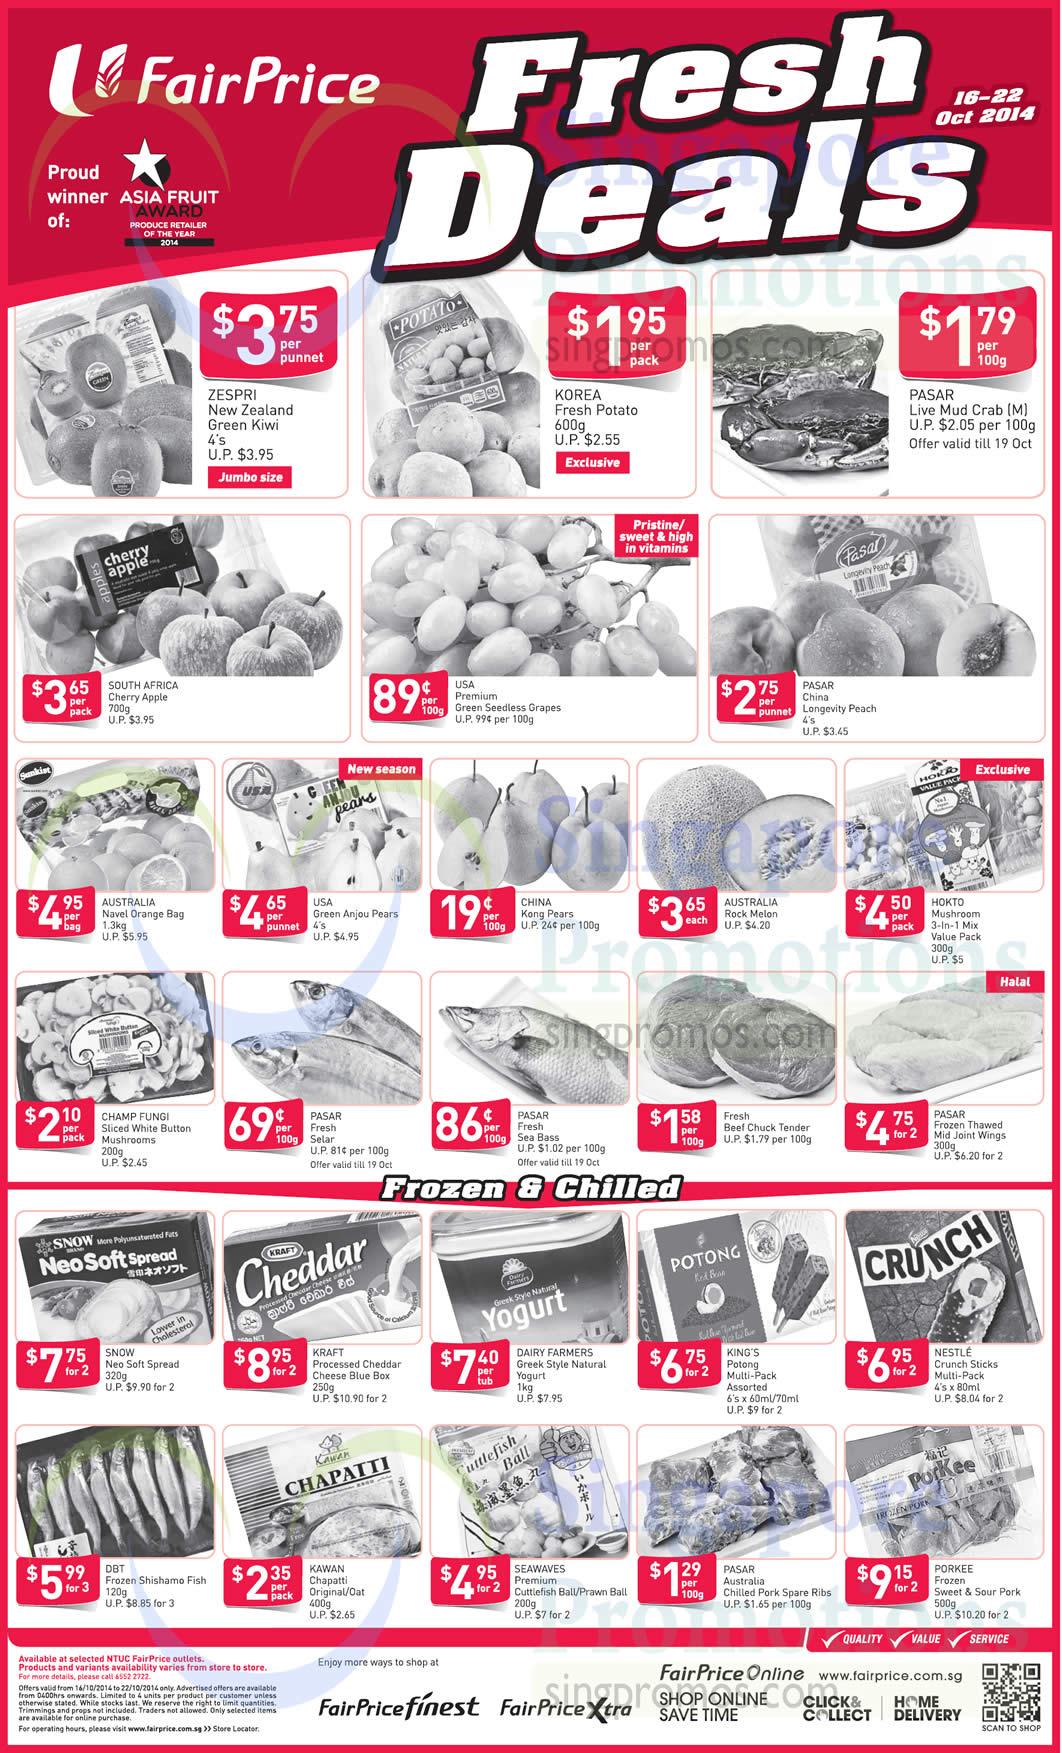 (Until 22 Oct) Fresh Deals Vegetables, Fruits, Frozen, Chilled